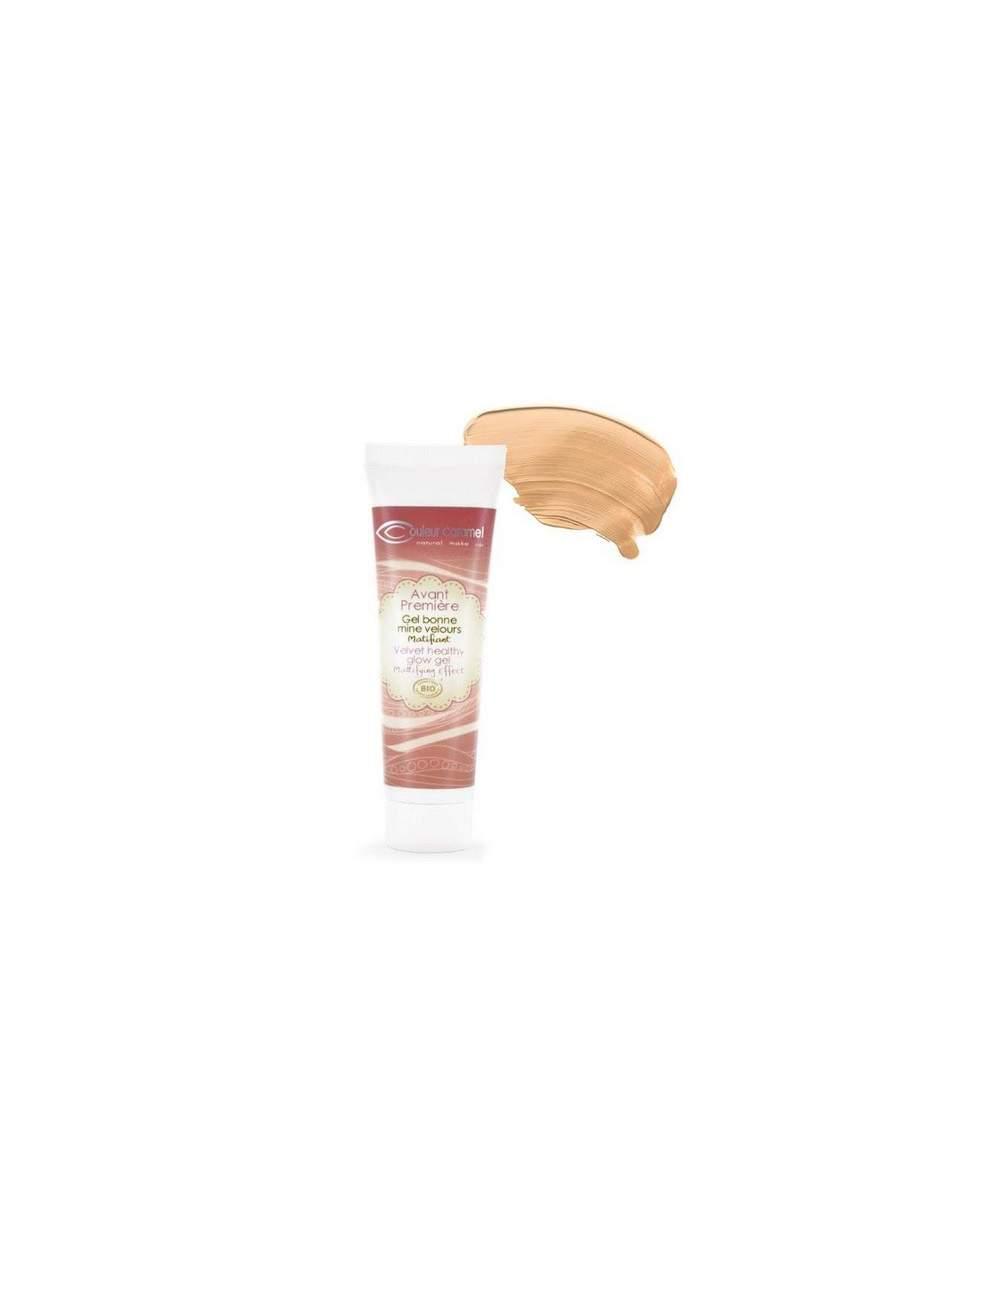 Maquillaje Bio Gel Buen Aspecto 61 Warm Sand. Couleur Caramel